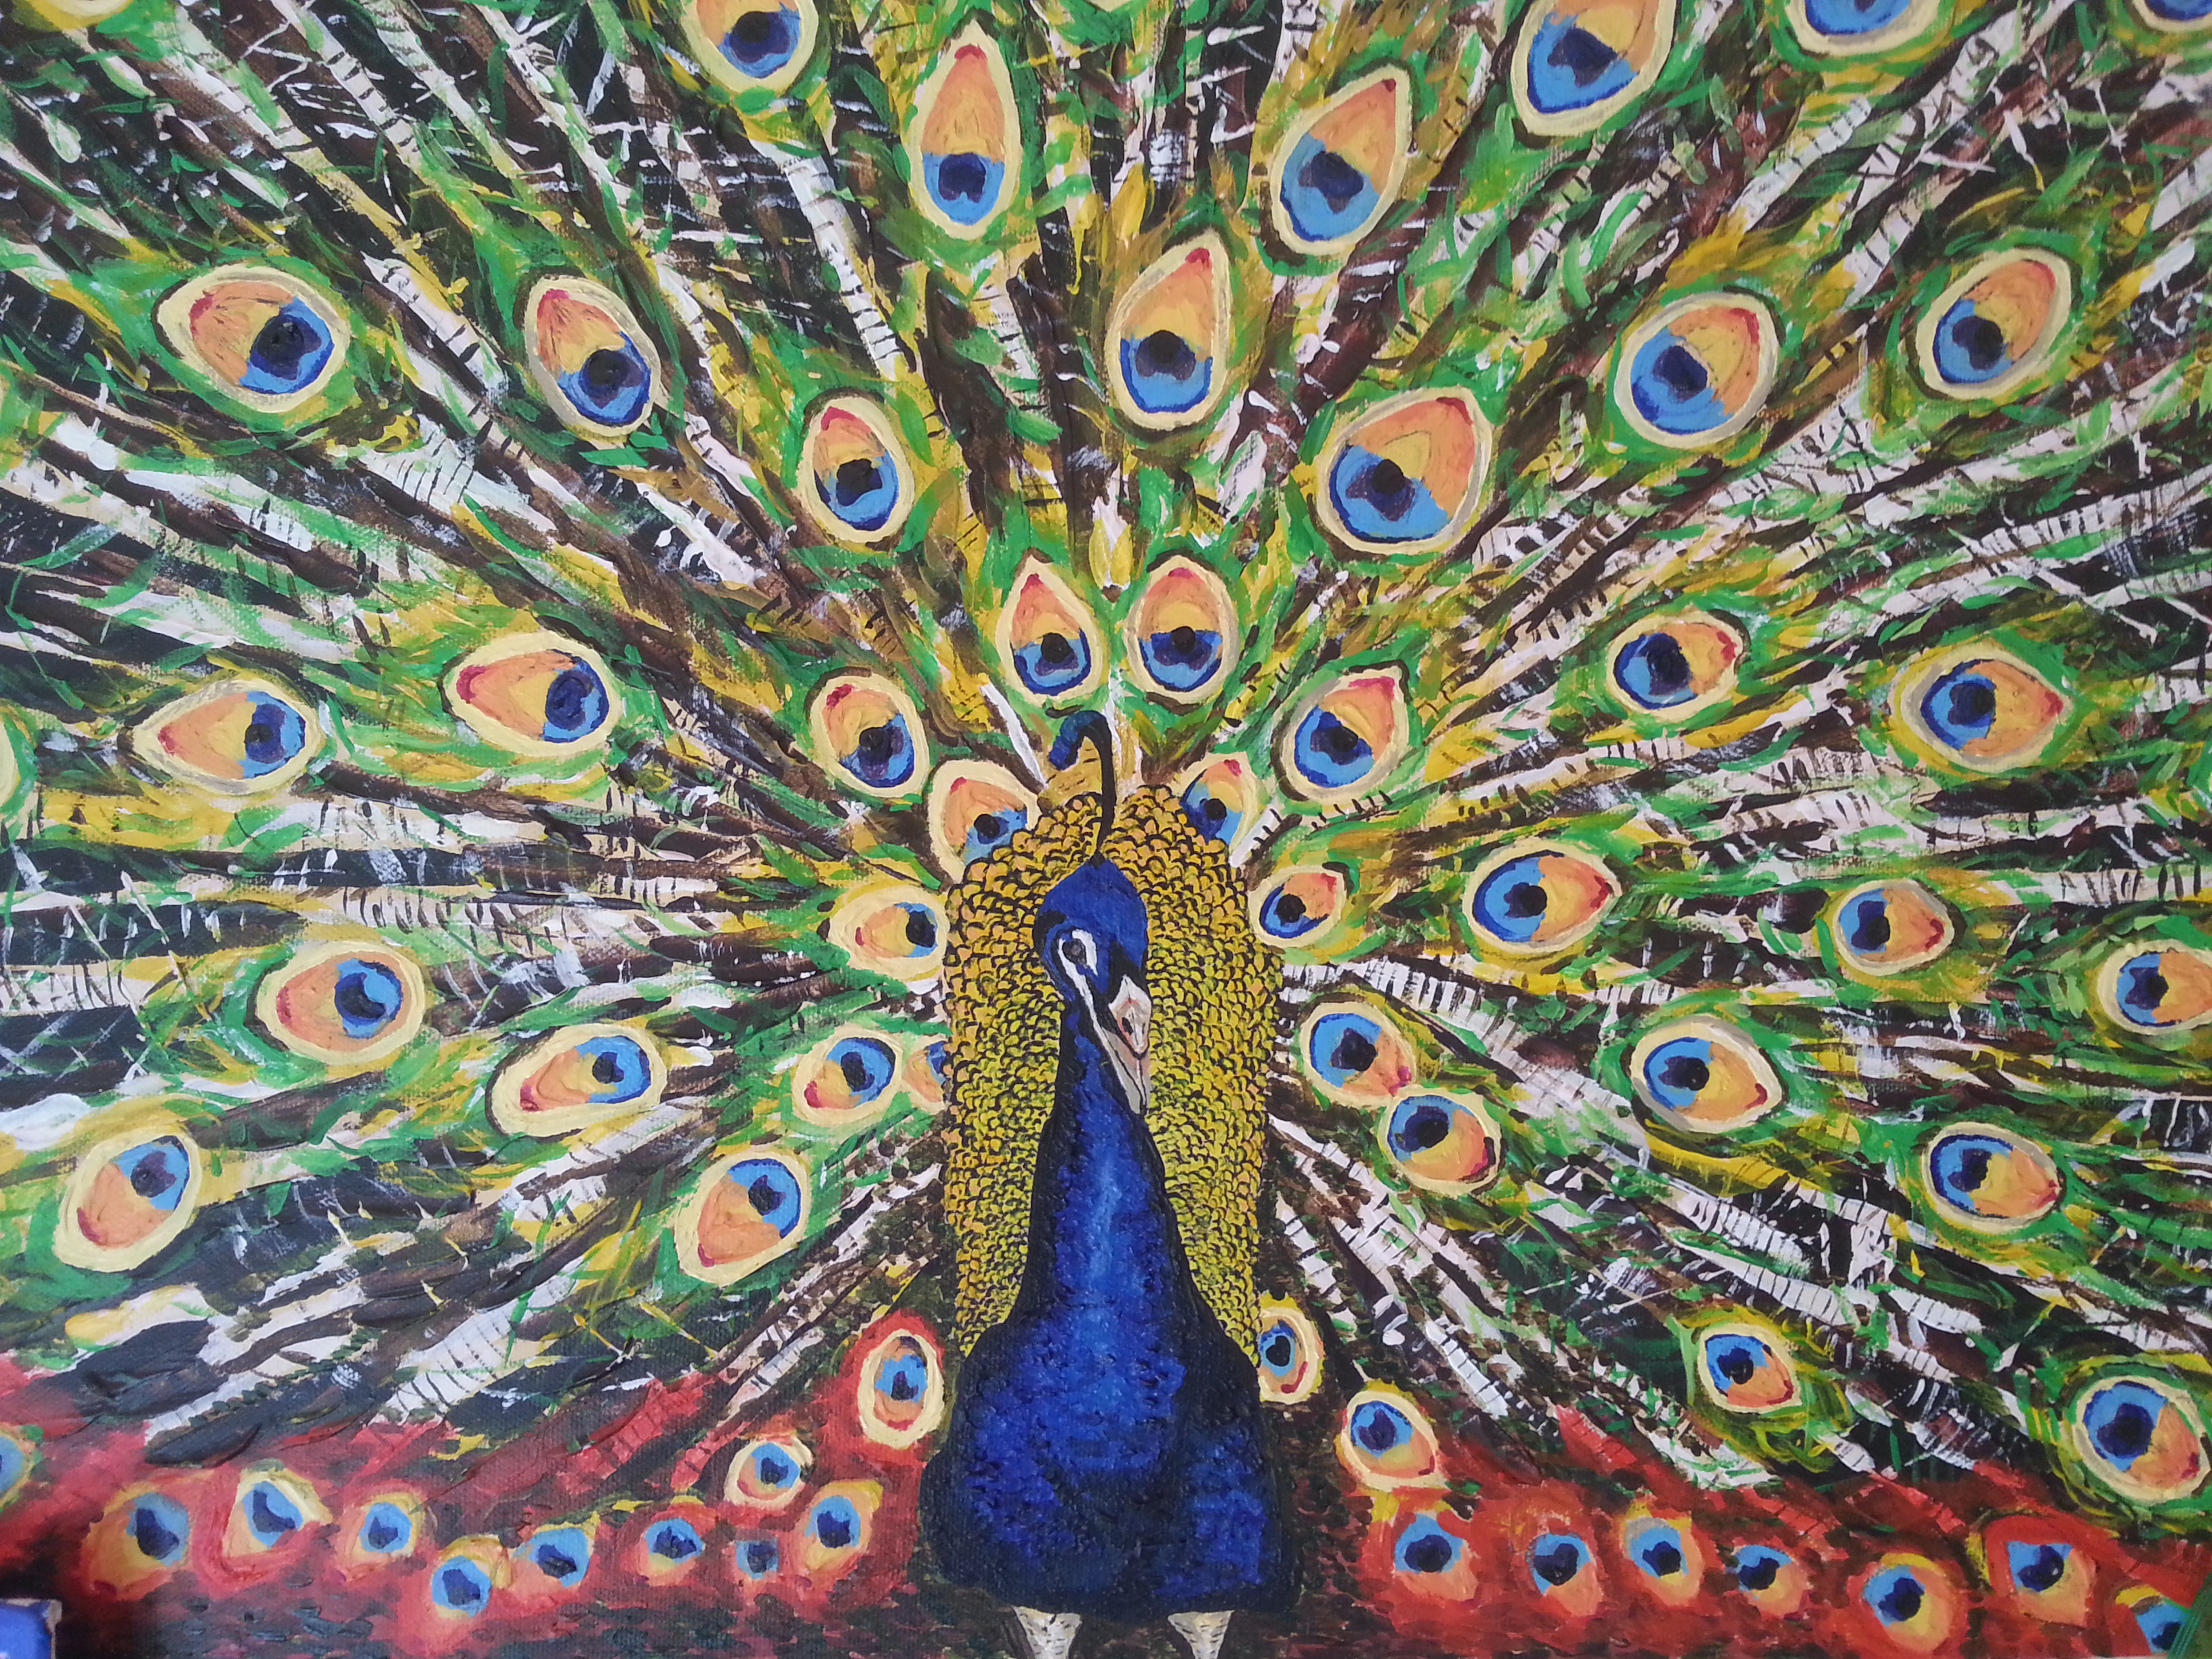 Peacock source google images.jpg